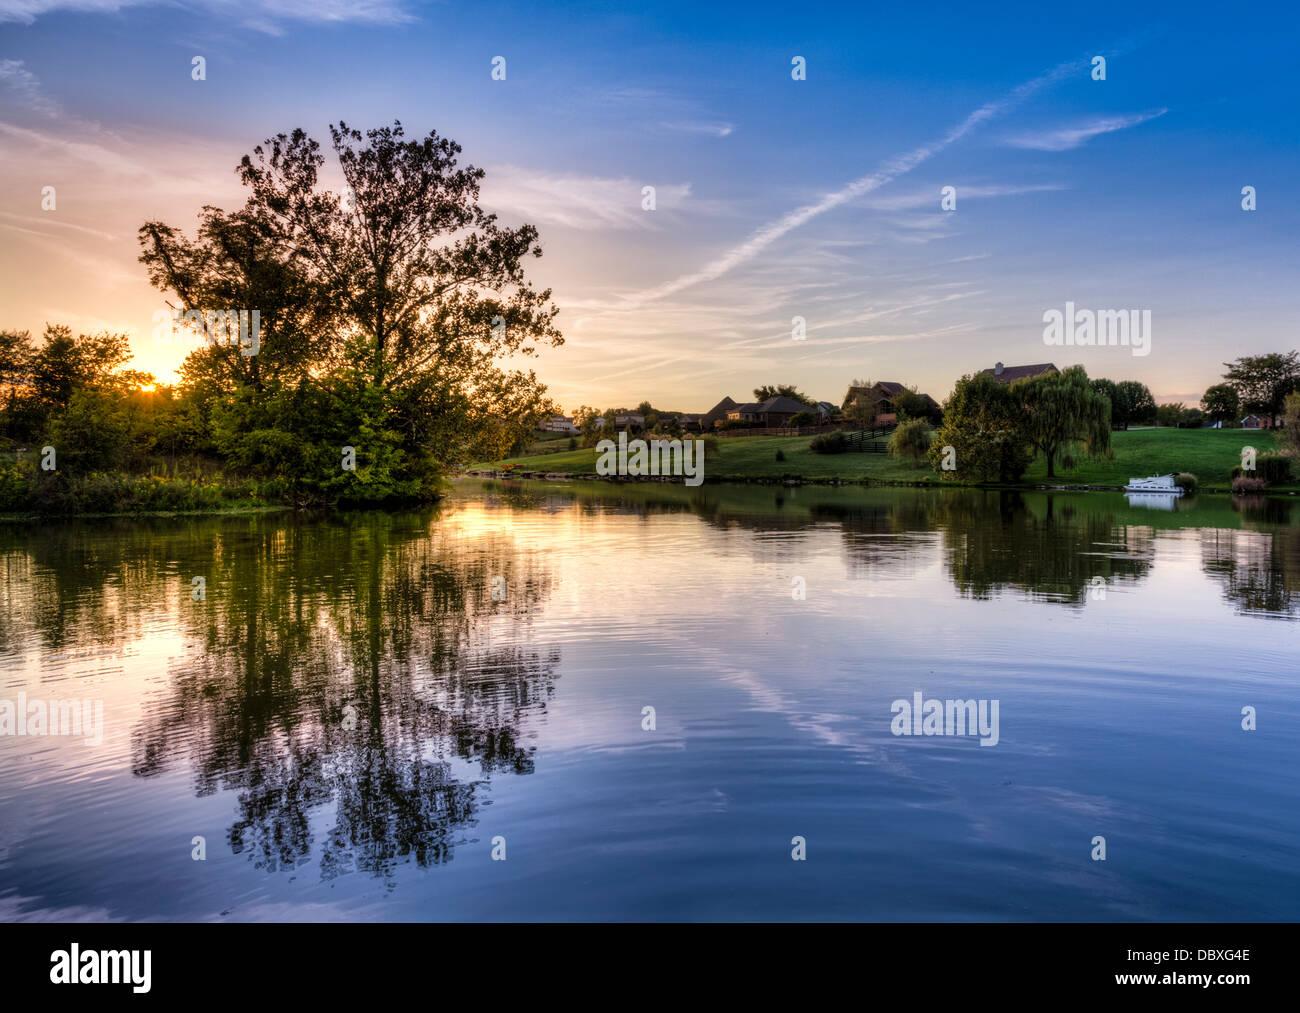 Sunset on a lake - Stock Image